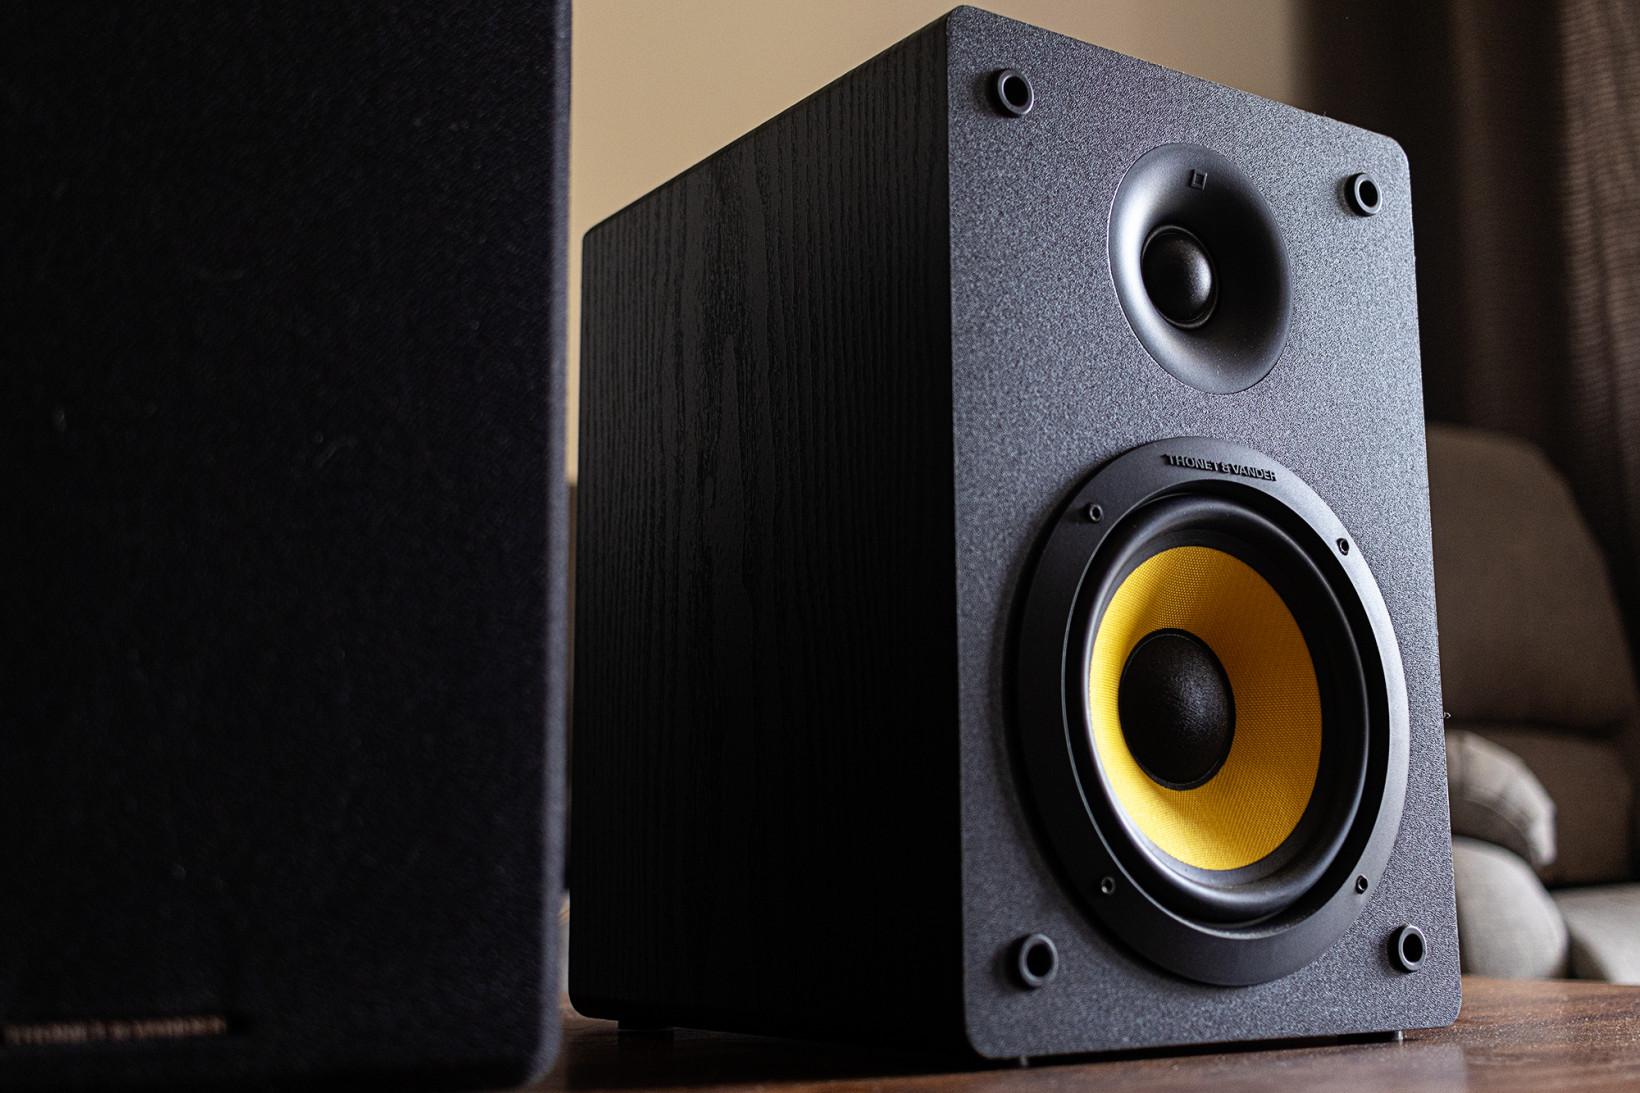 Thonet & Vander's Kubris speakers are a handsome, discreet pair